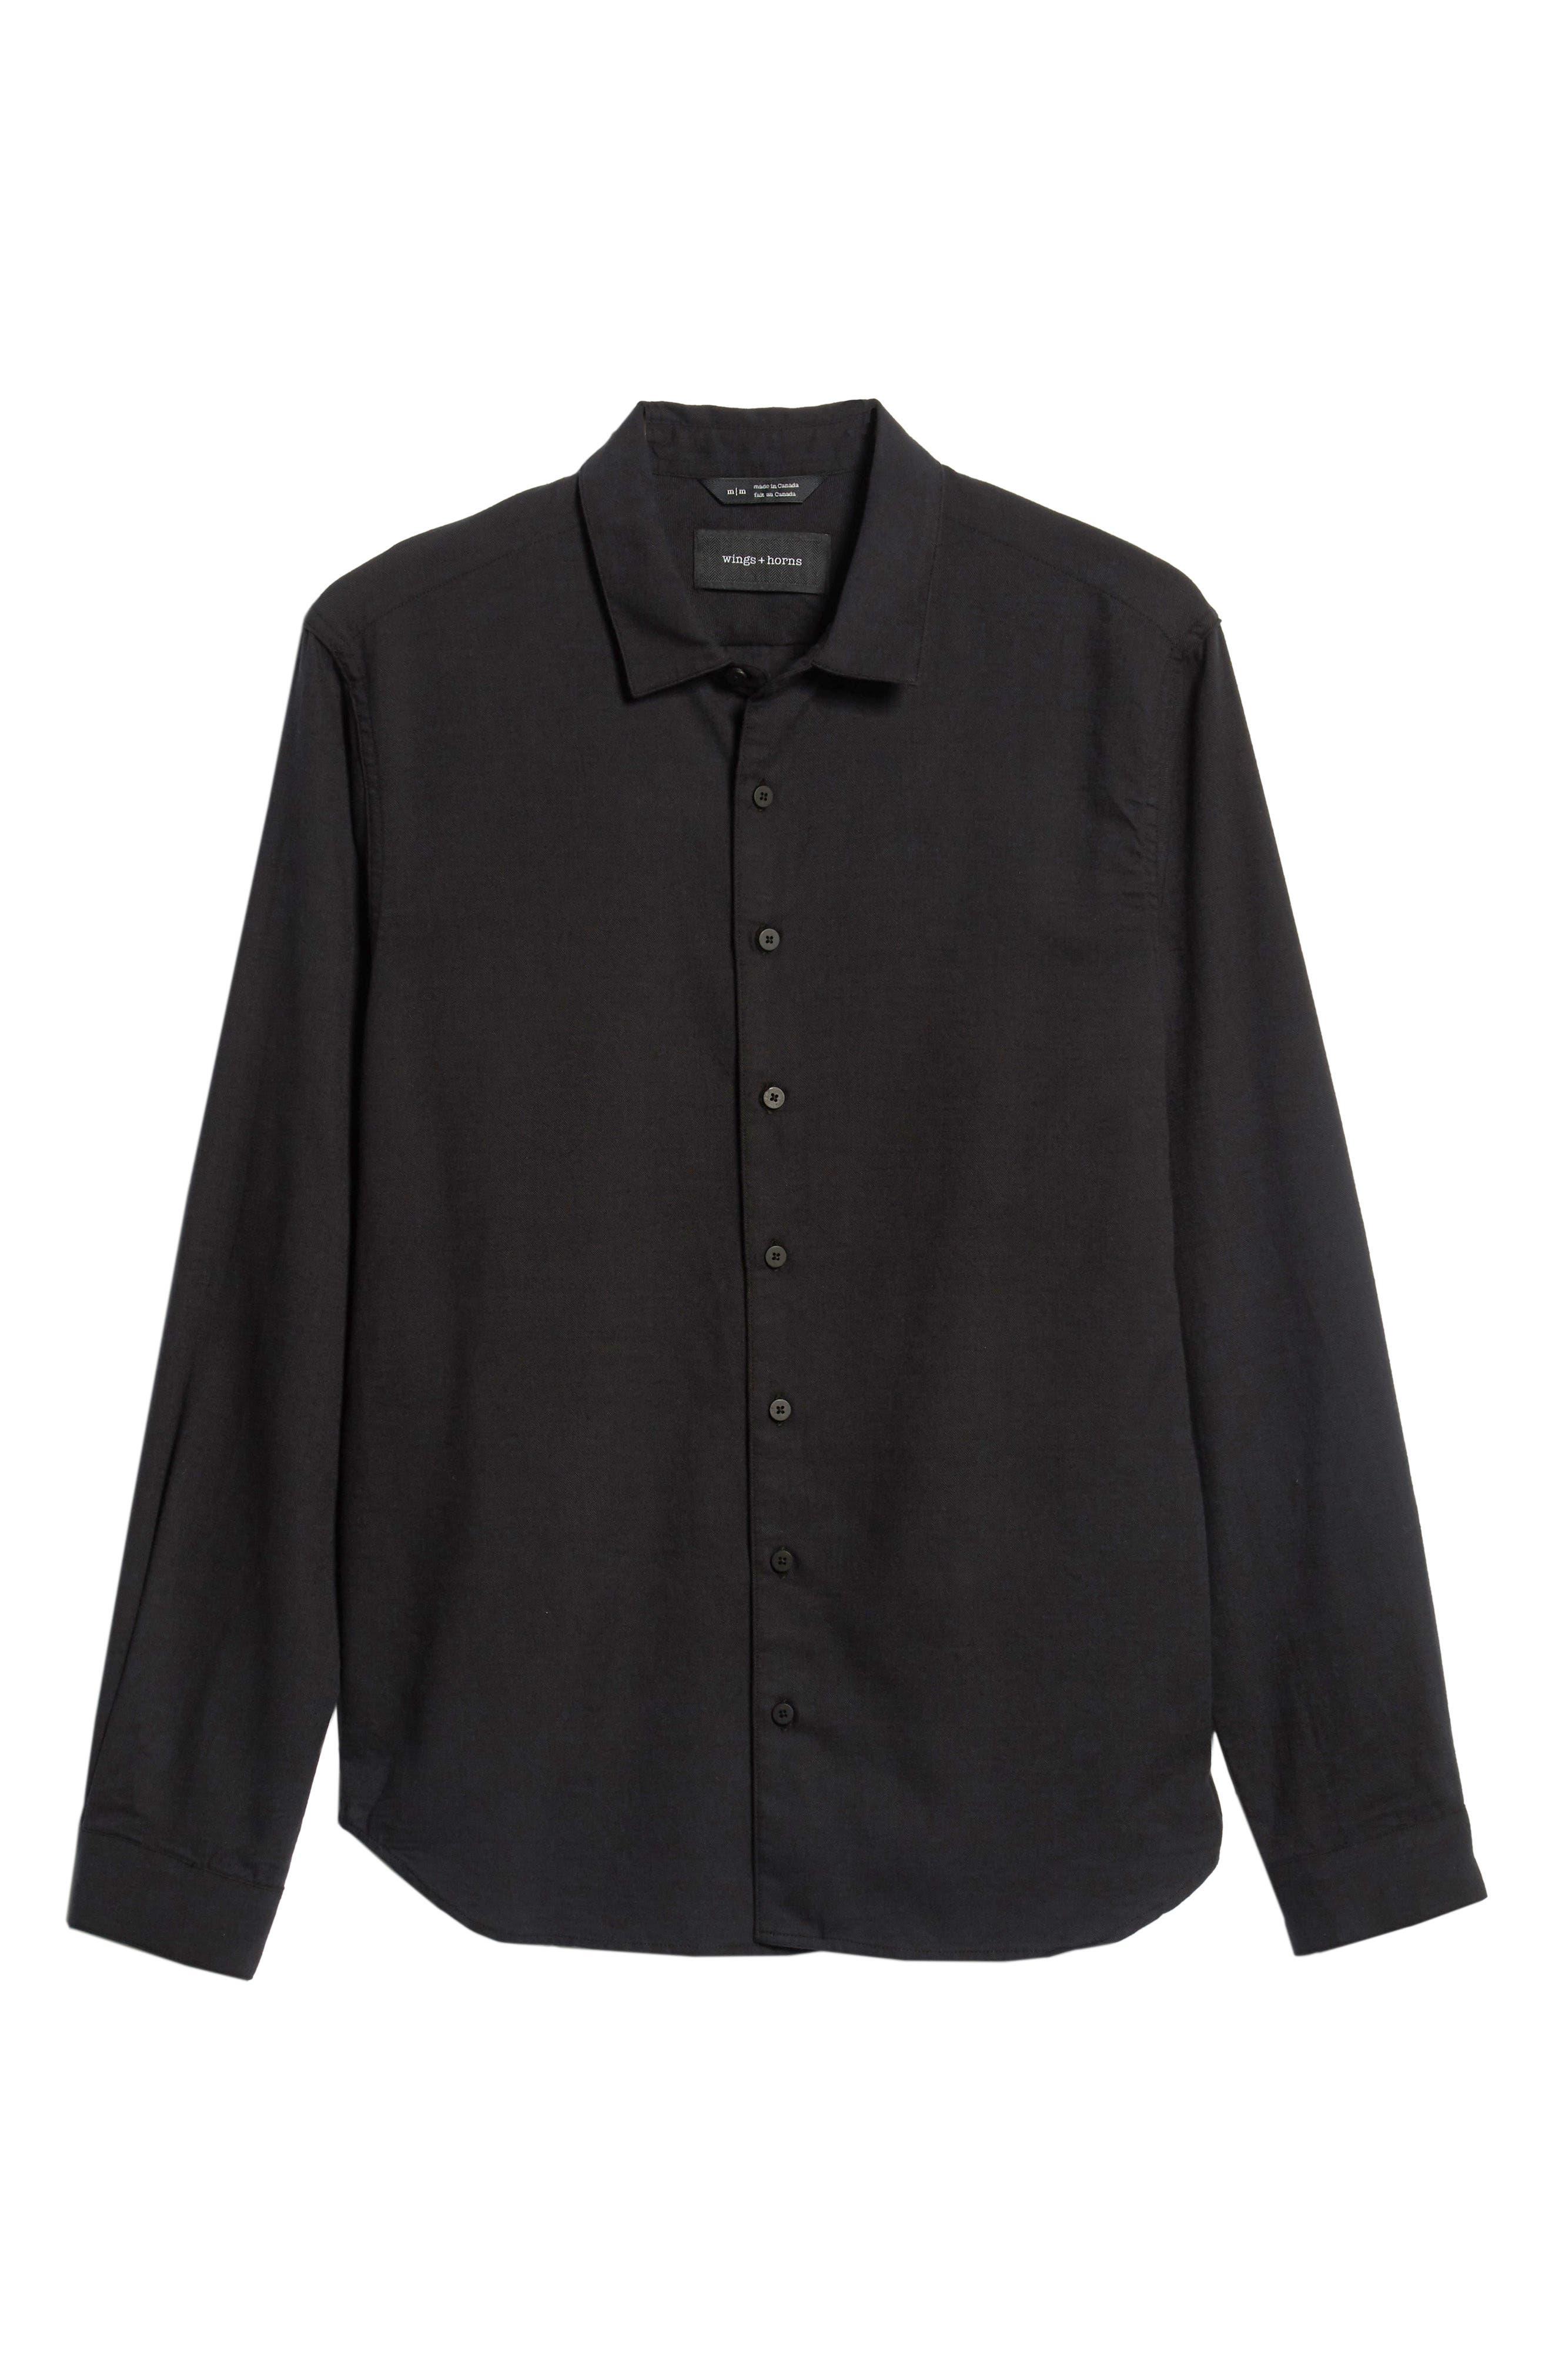 Officer Sport Shirt,                             Alternate thumbnail 5, color,                             MIDNIGHT